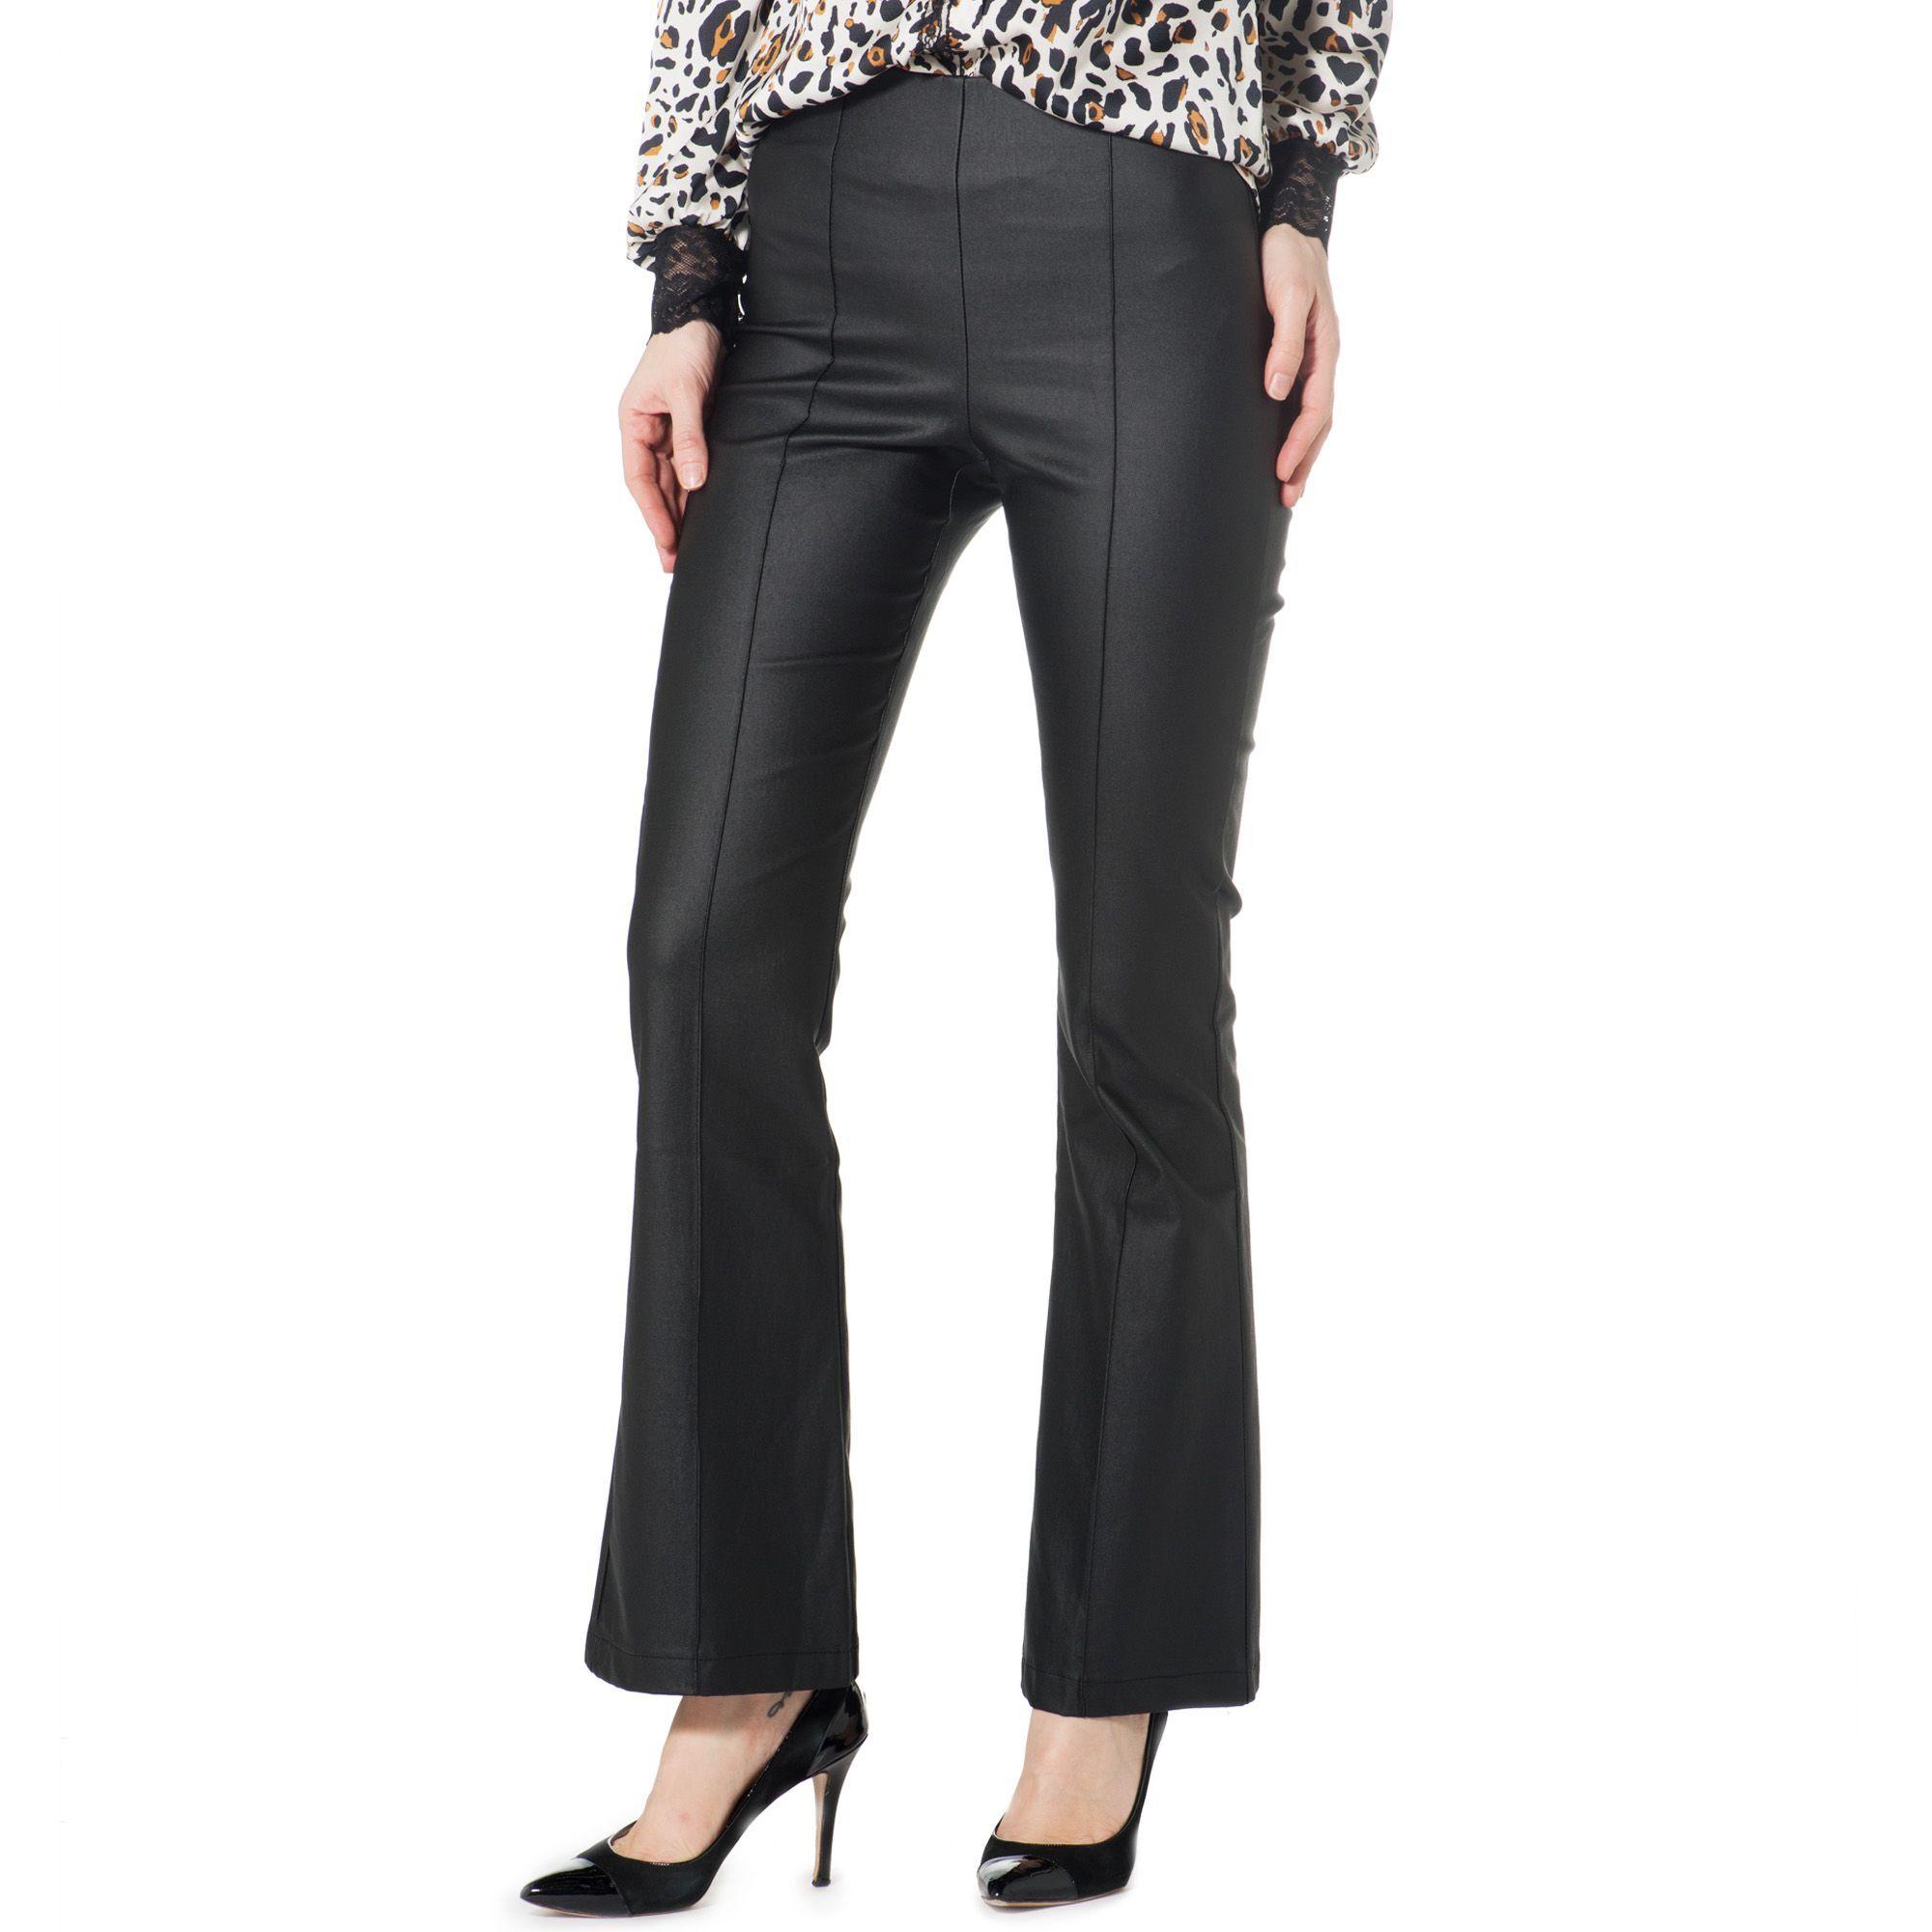 Officina della Moda Pantaloni made in Italy in similpelle